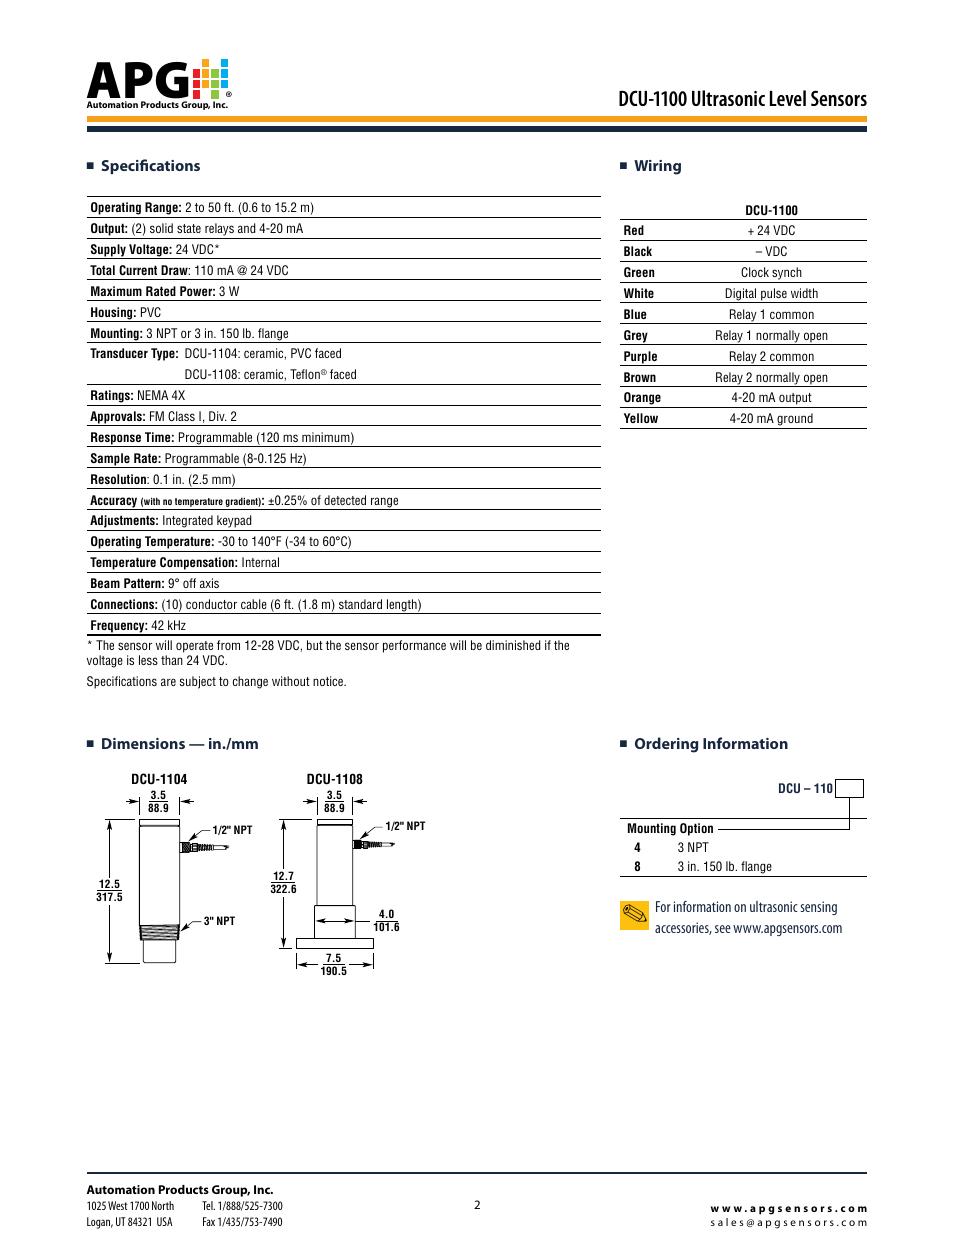 Dcu-1100 ultrasonic level sensors, Dimensions — in./mm, Wiring  